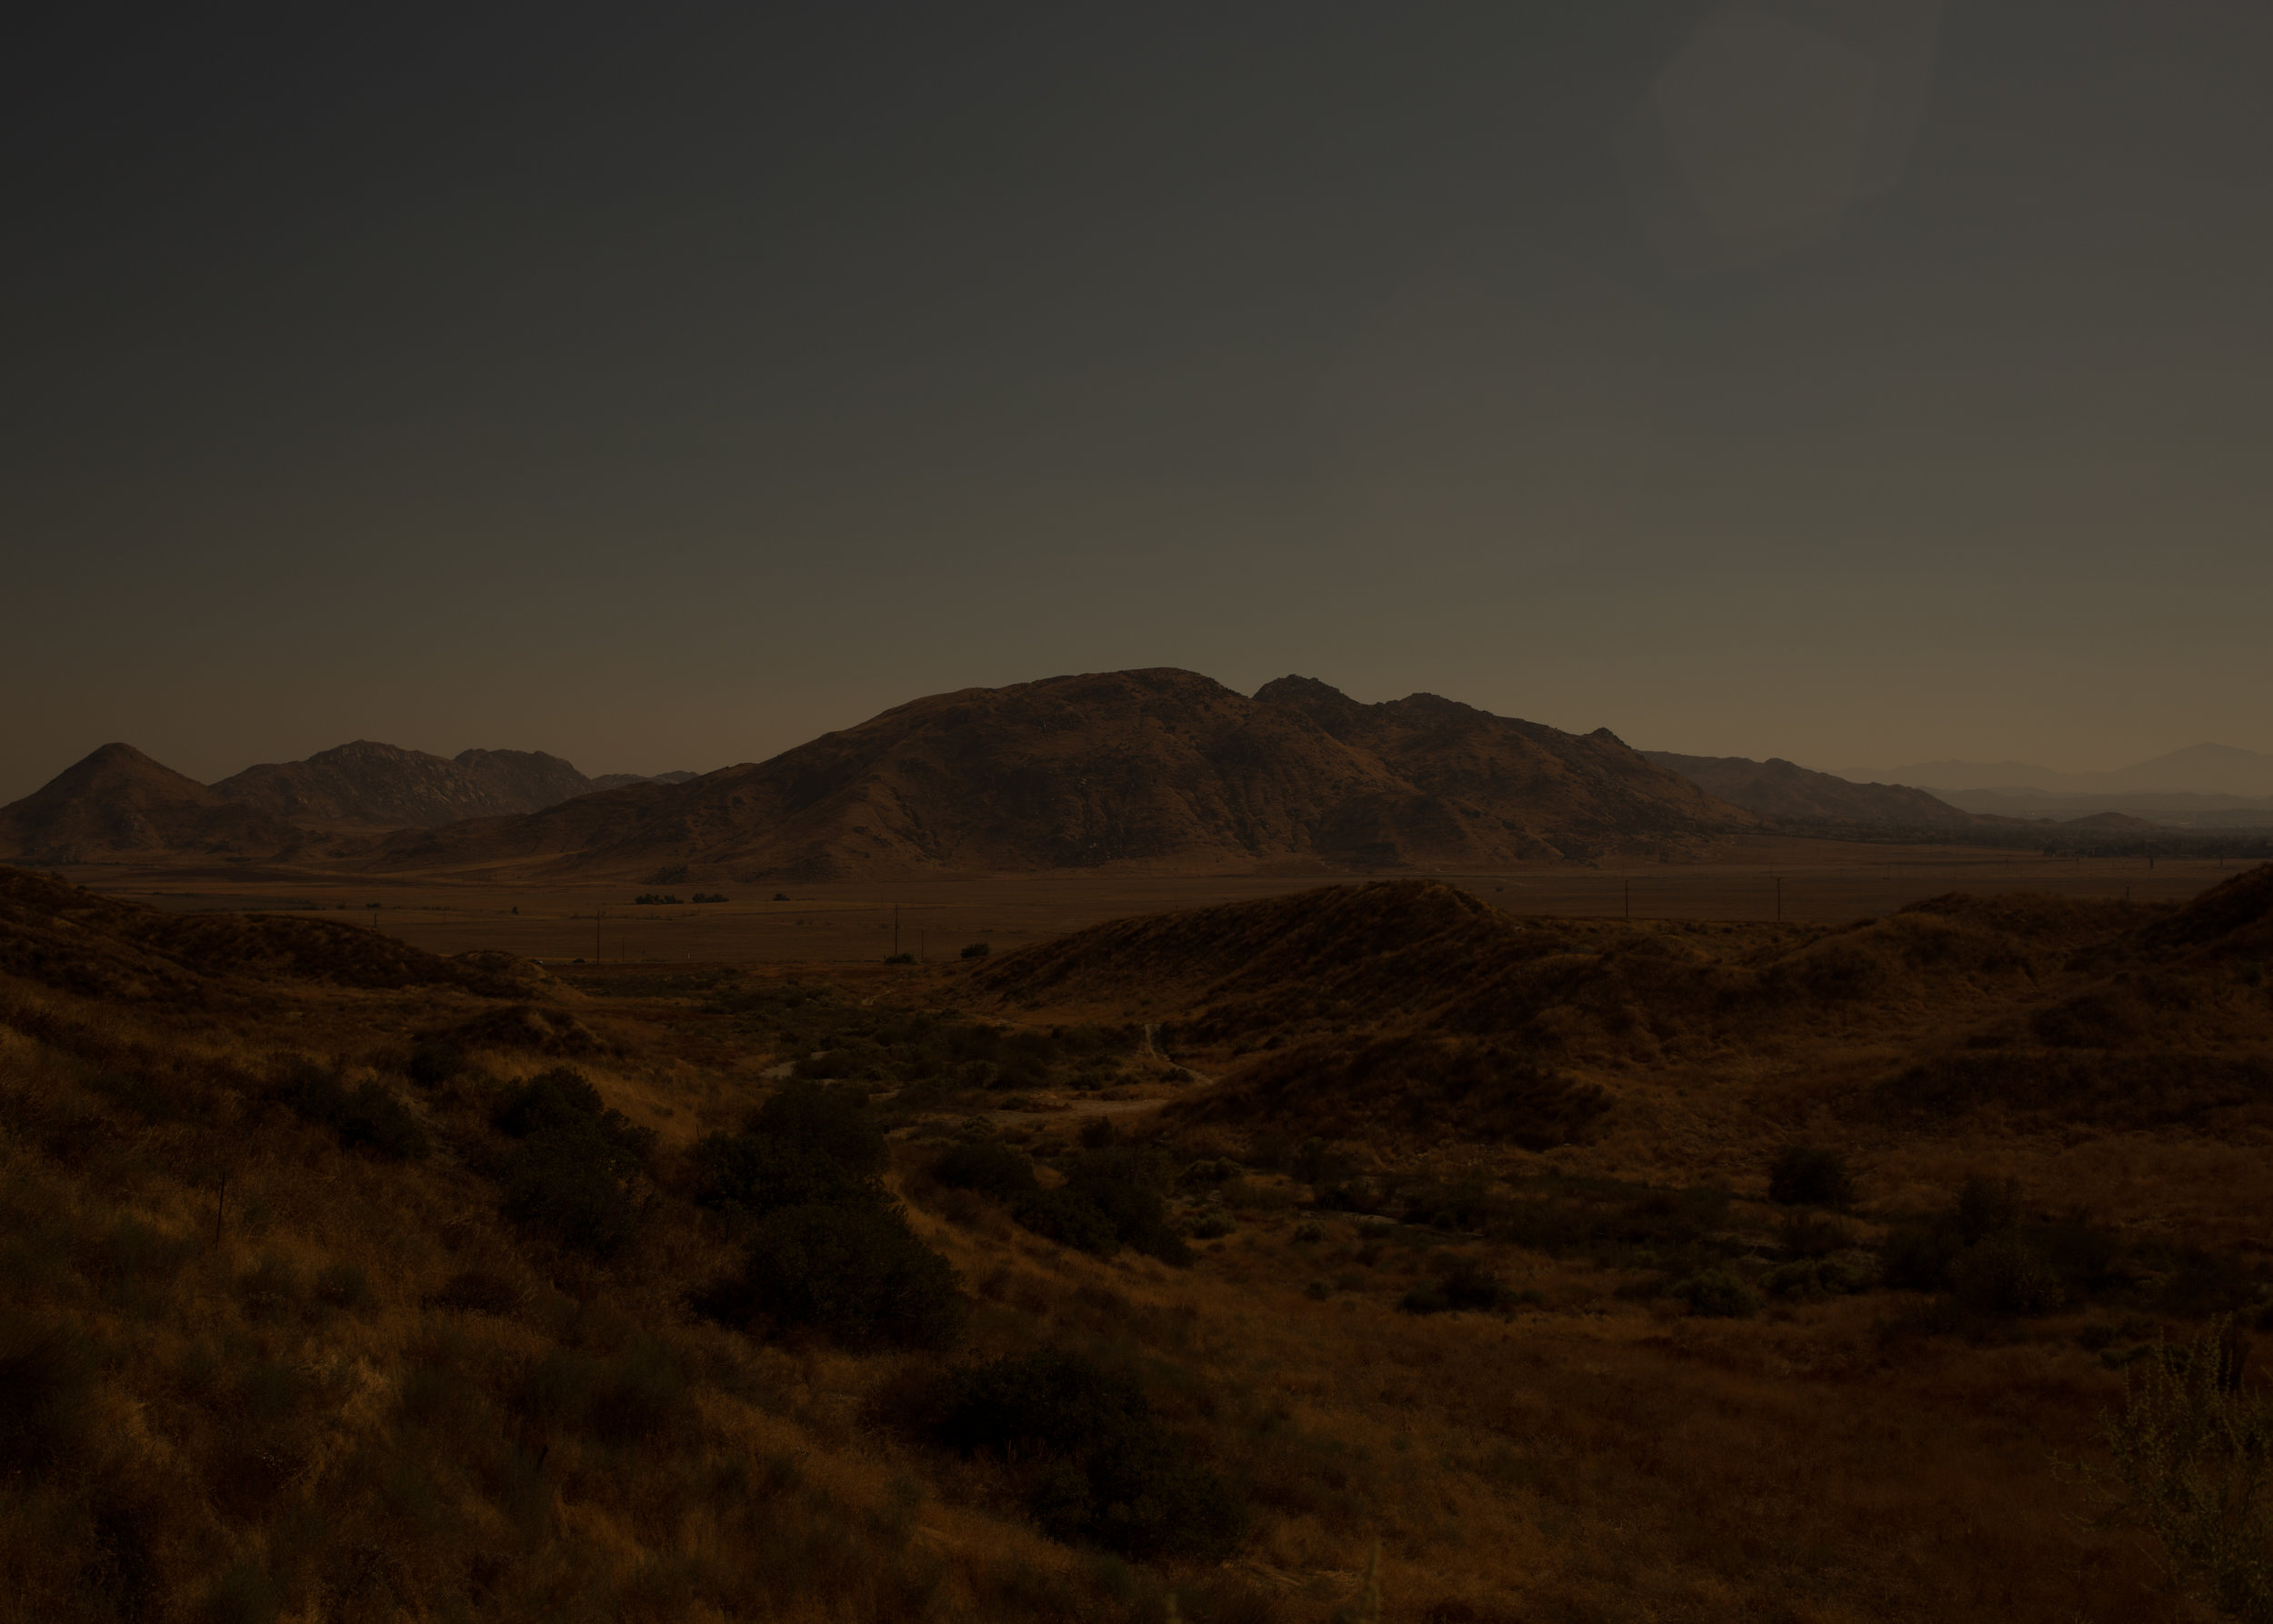 22_Mountains, Perris.jpg